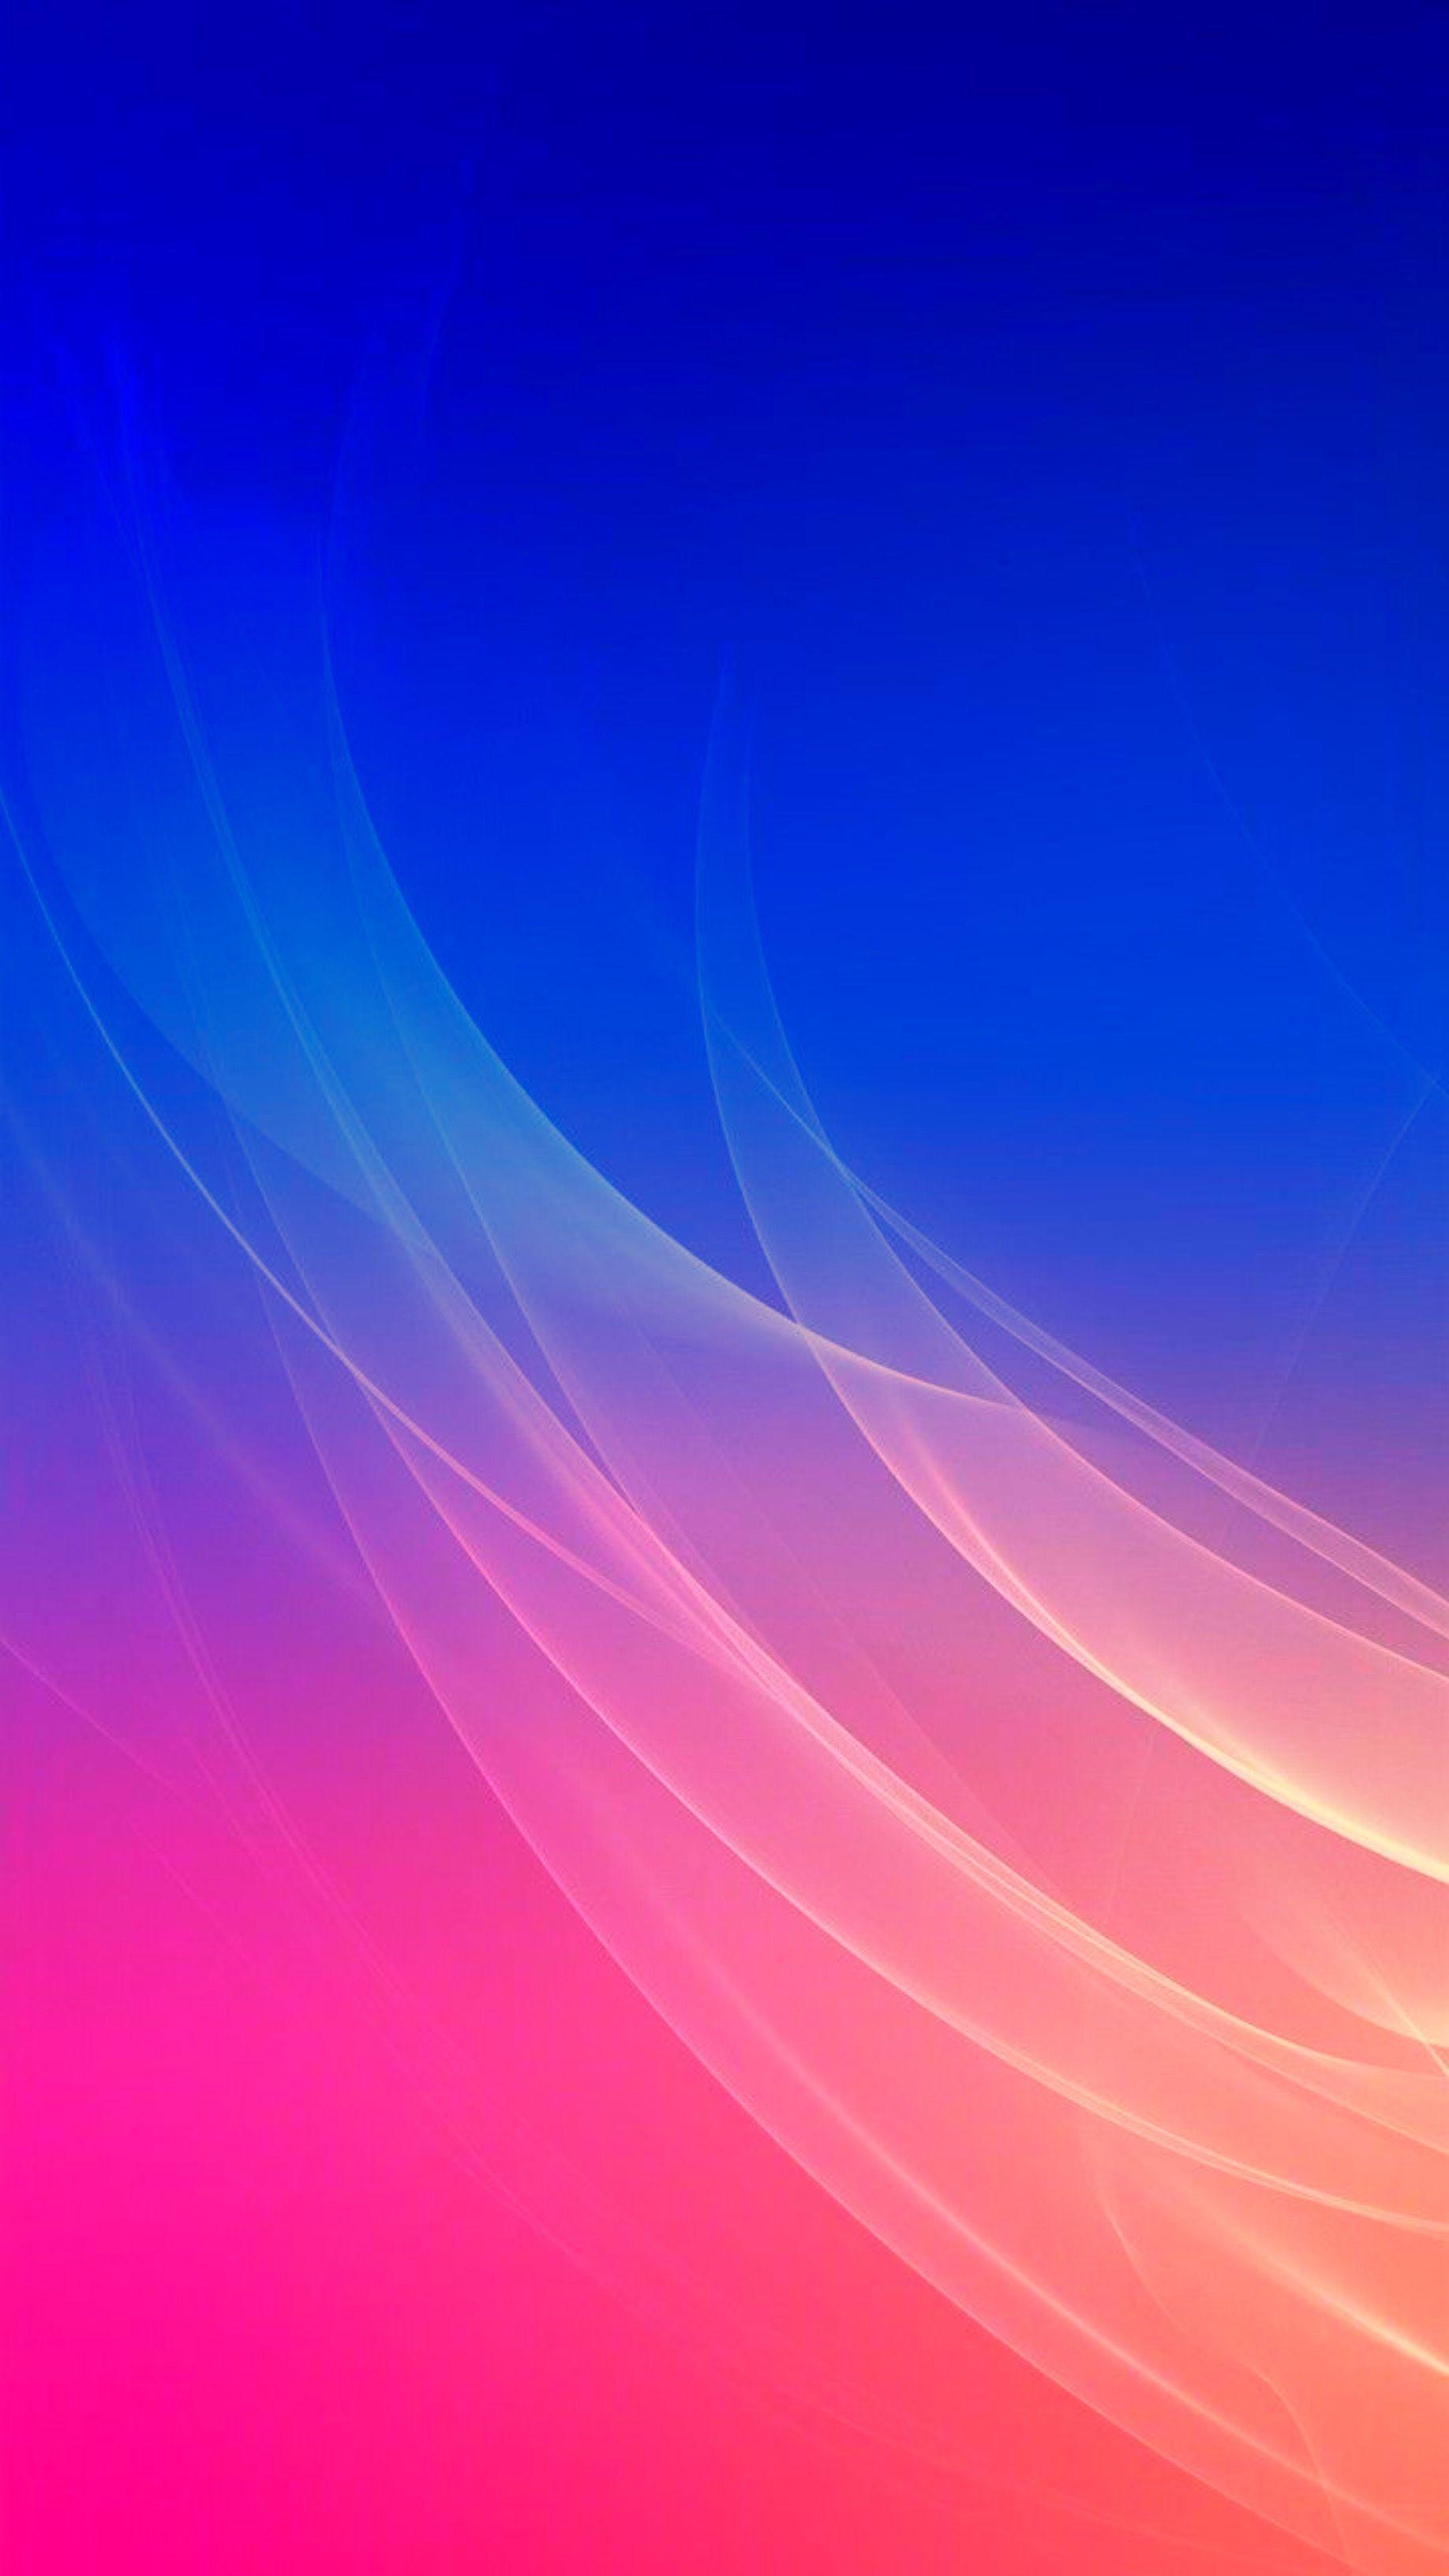 Samsung Galaxy A20 Duvar Kagitlari 1836x3264 Download Hd Wallpaper Wallpapertip